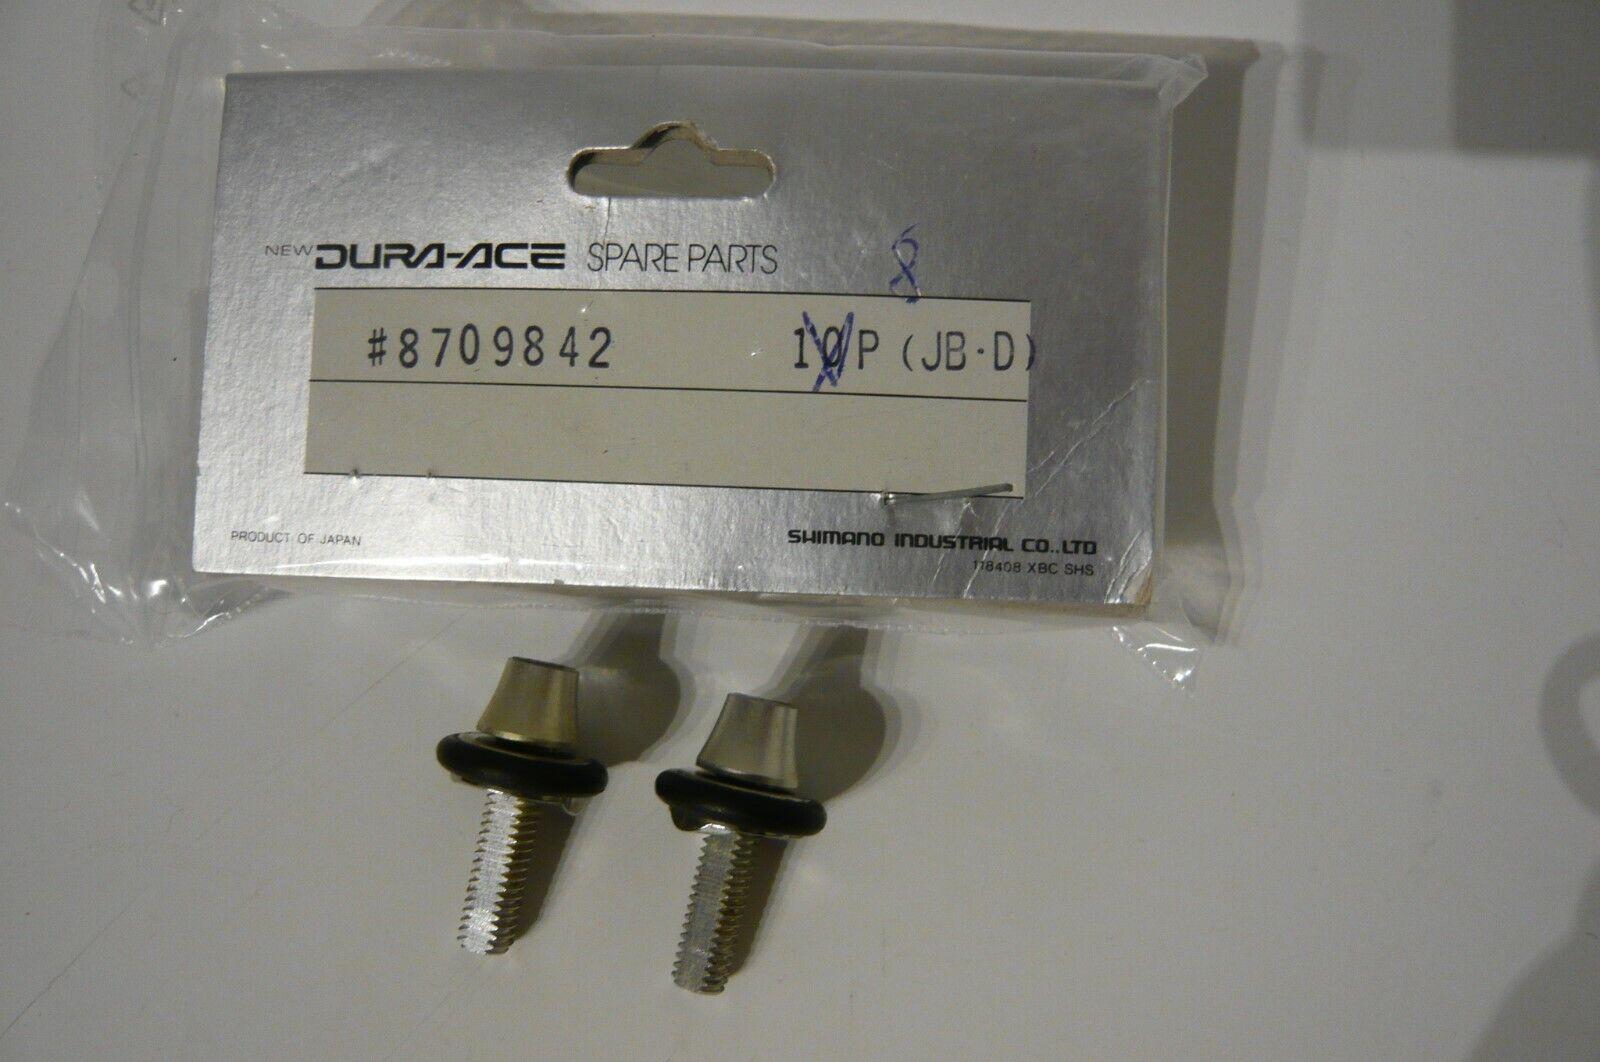 Shimano Dura Ace  7400 cable adjusting unit x 2  high-quality merchandise and convenient, honest service